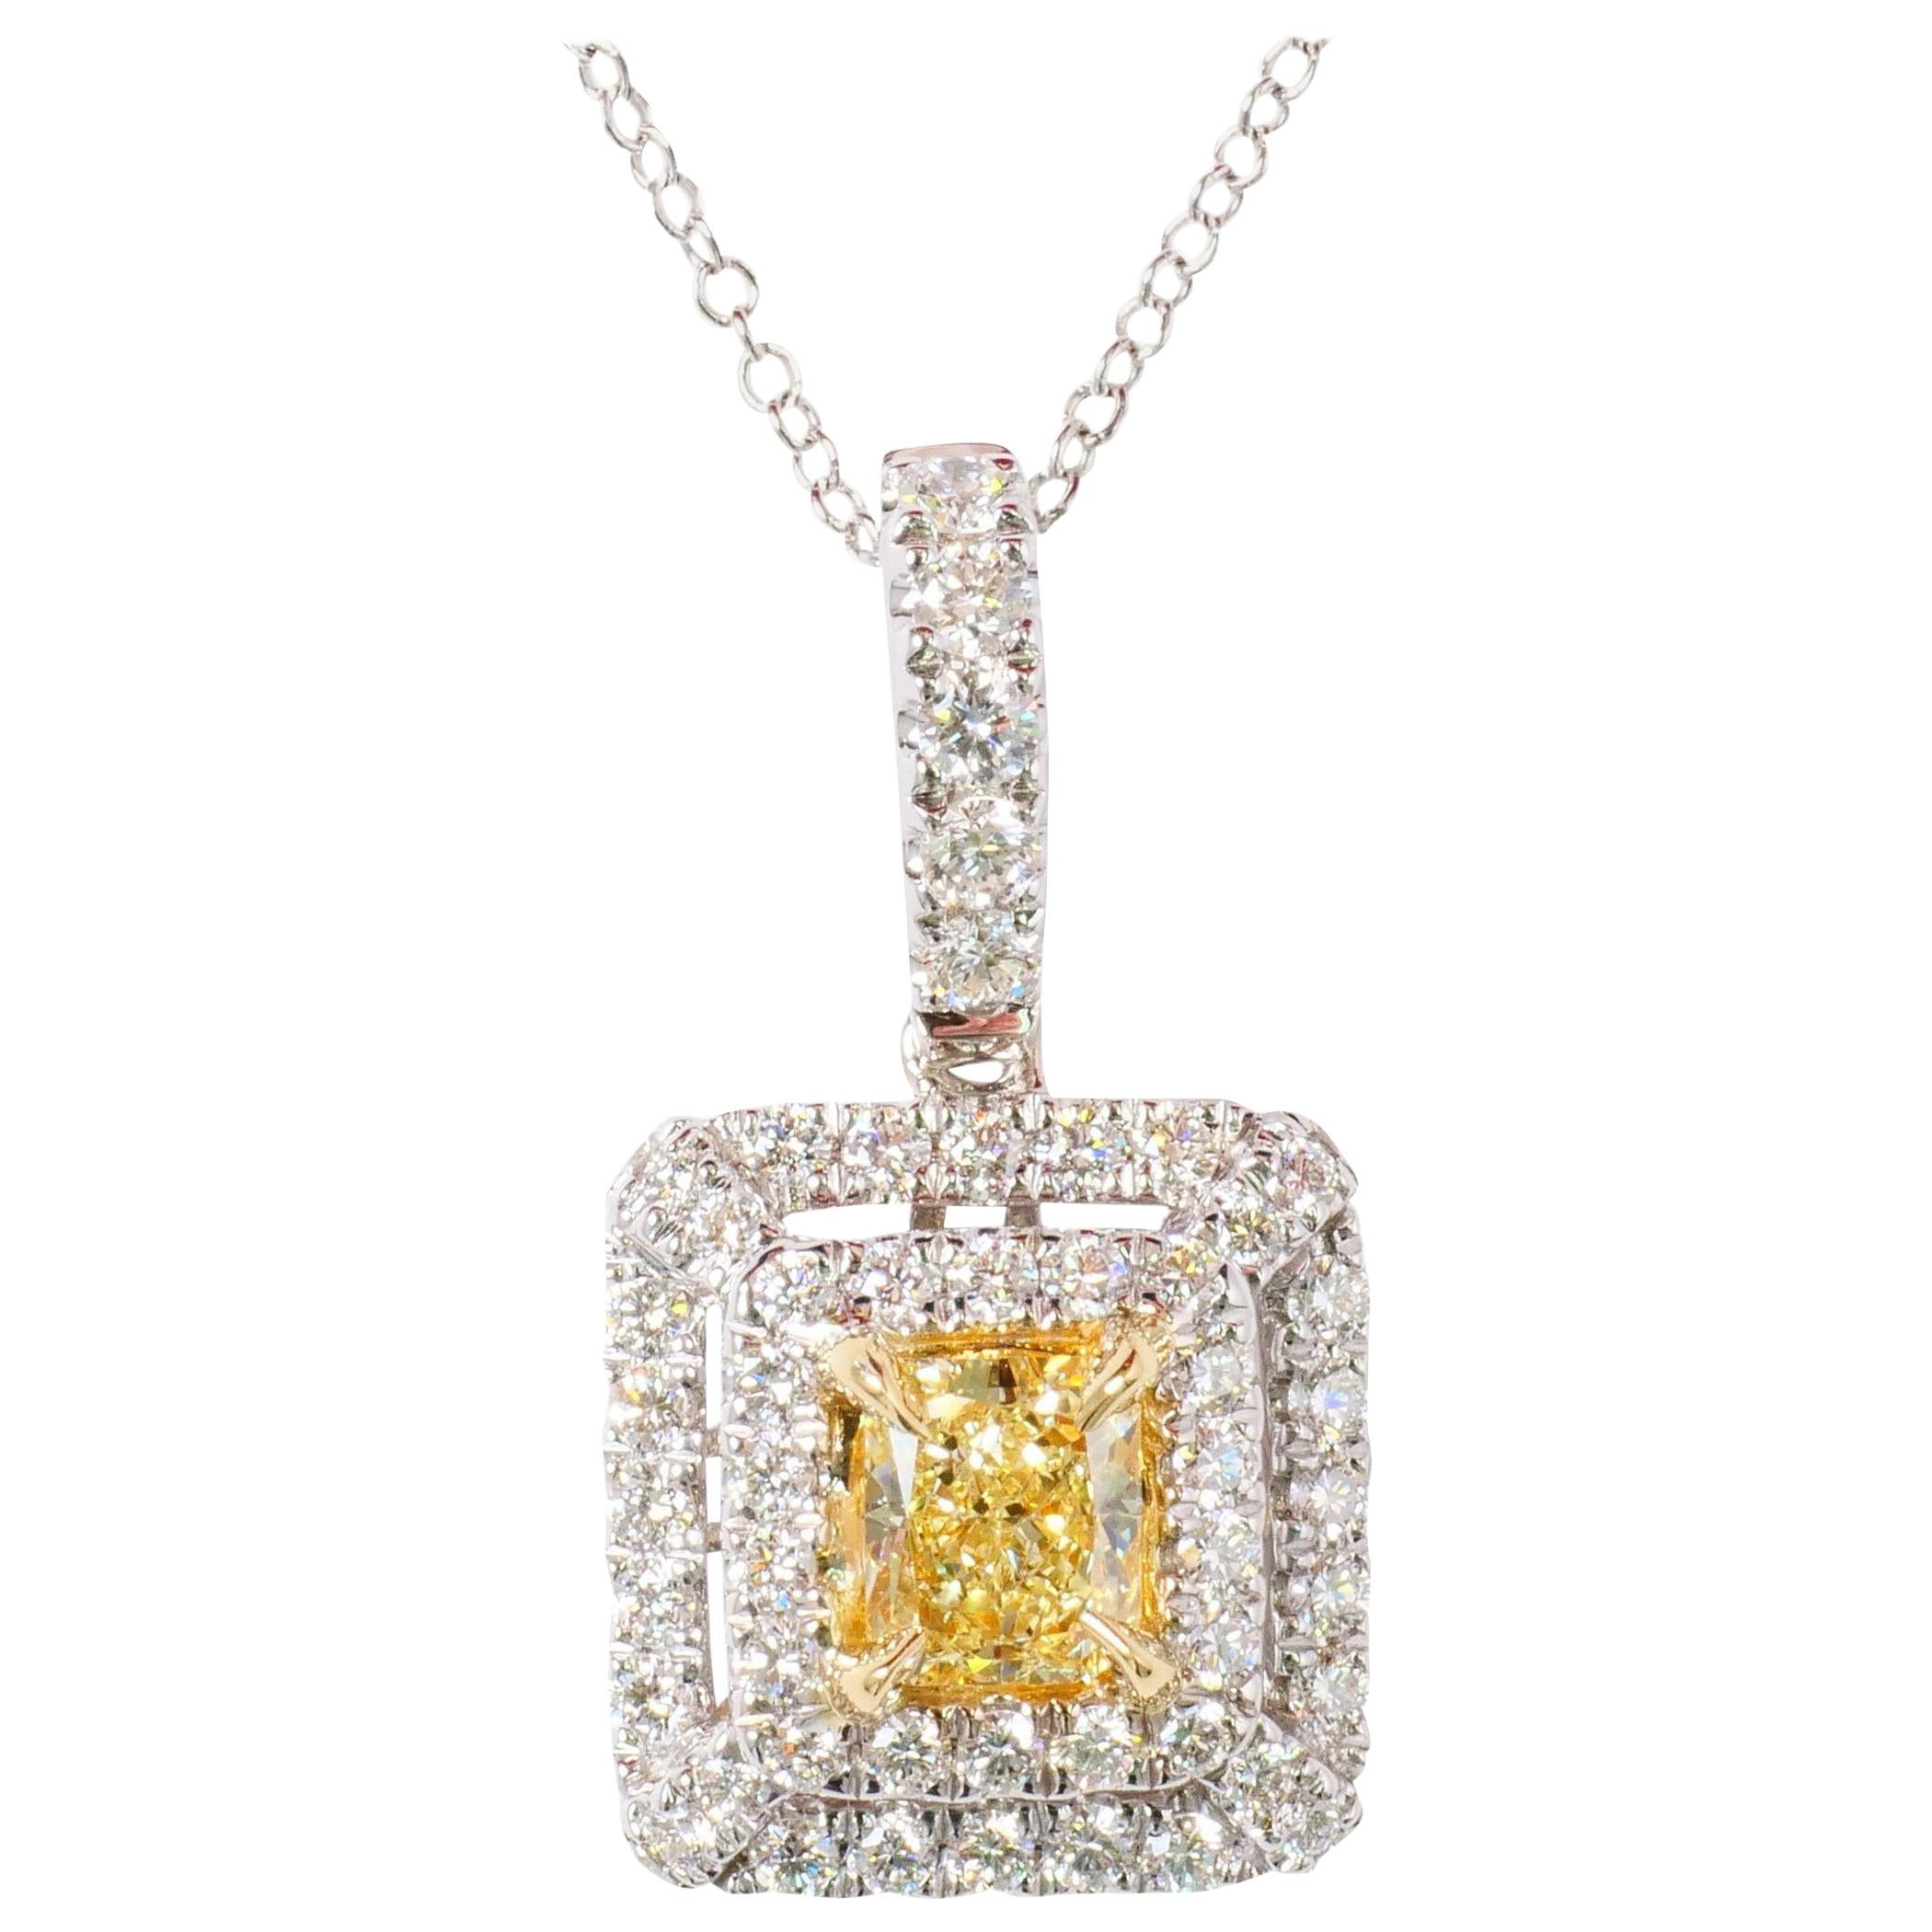 Natural Yellow Cushion Cut Diamond 0.52 Carat and White Diamond Pendant 18k Gold